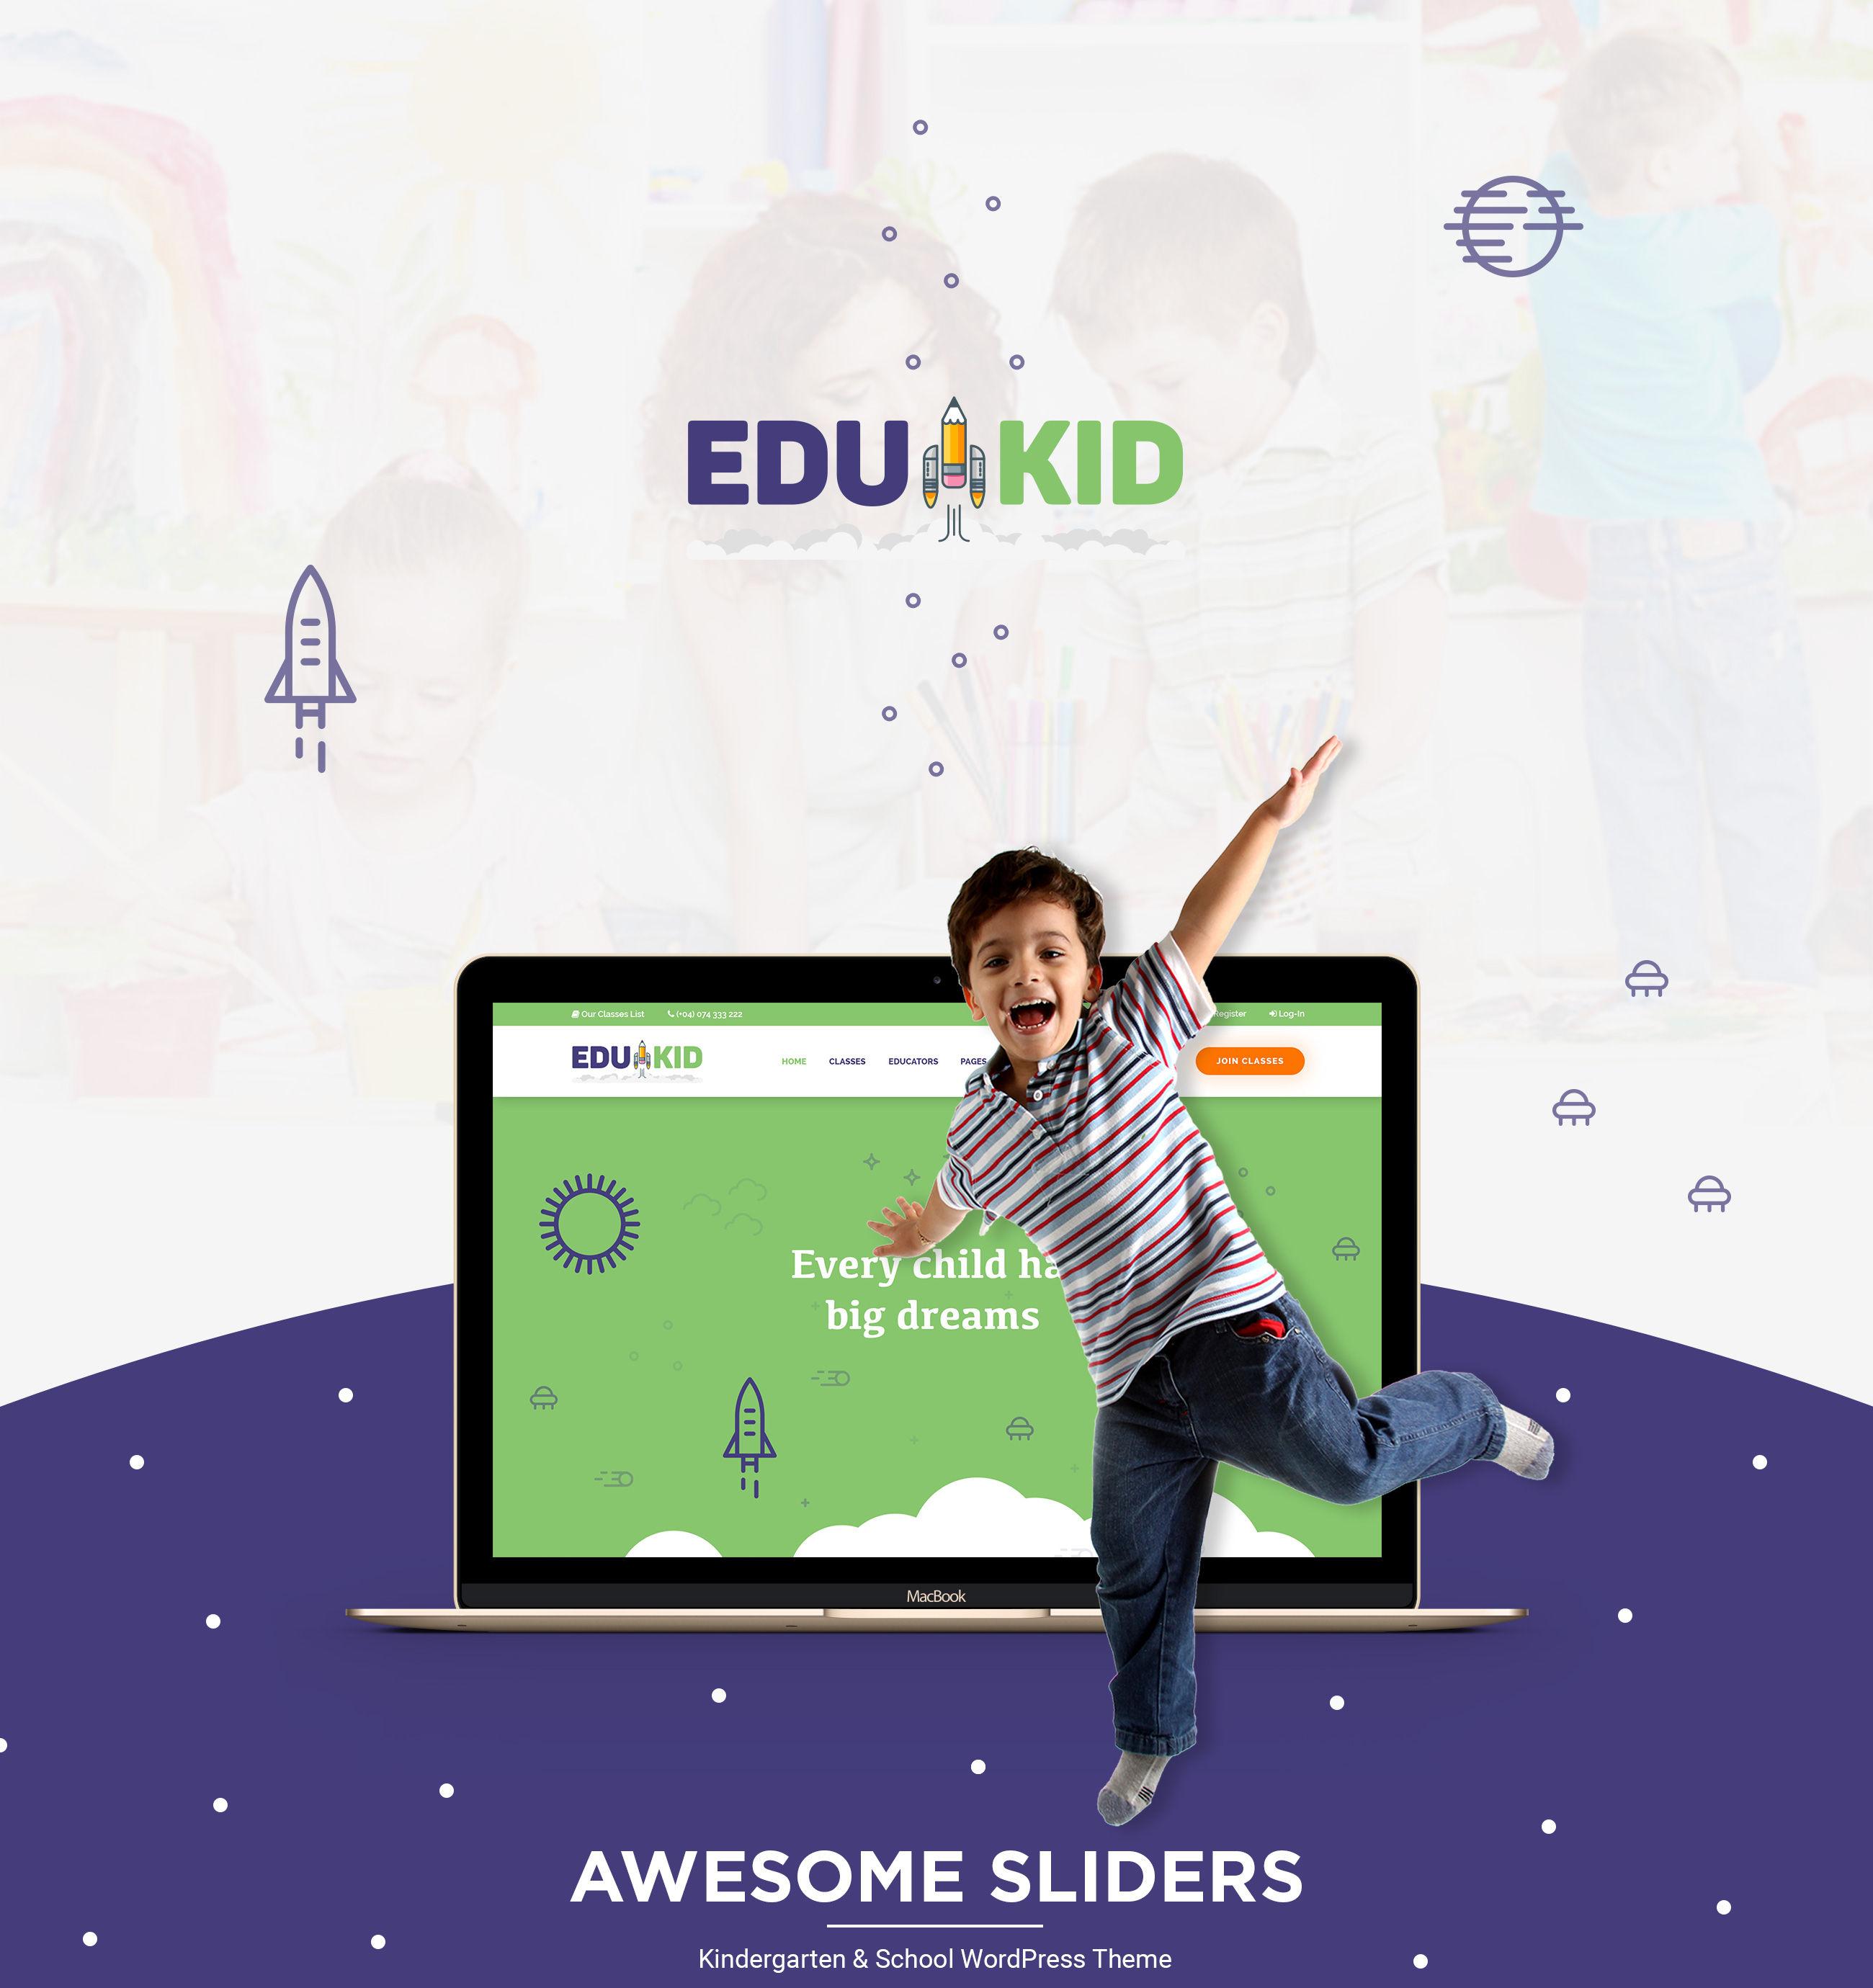 edukid_description1